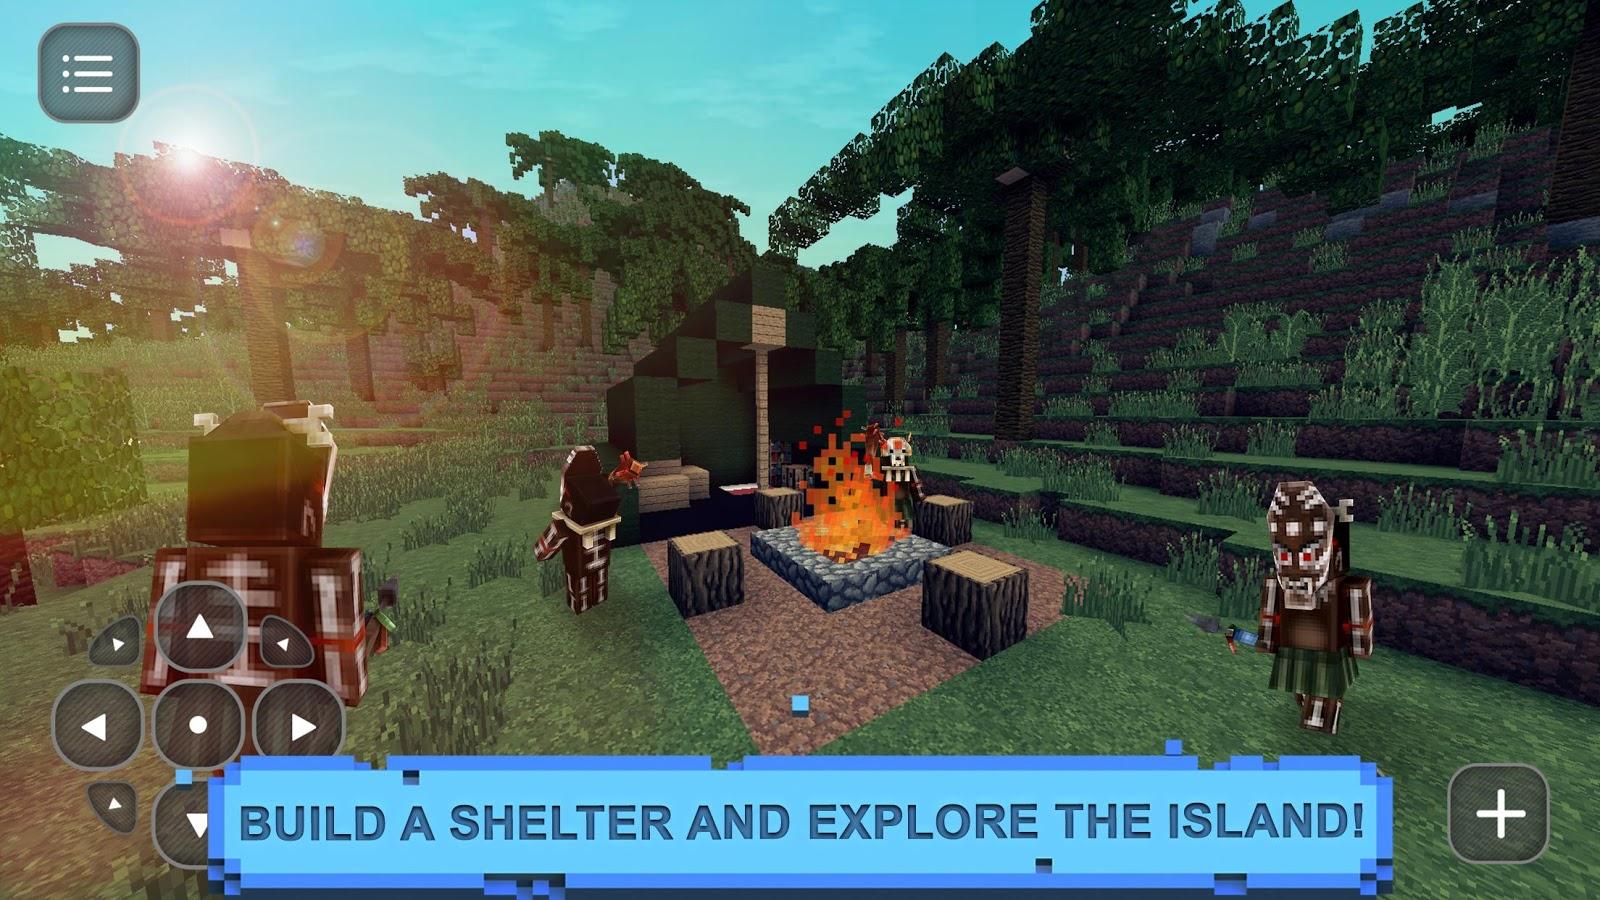 Survival island build craft 15 apk download android adventure games survival island build craft 15 screenshot 8 malvernweather Choice Image